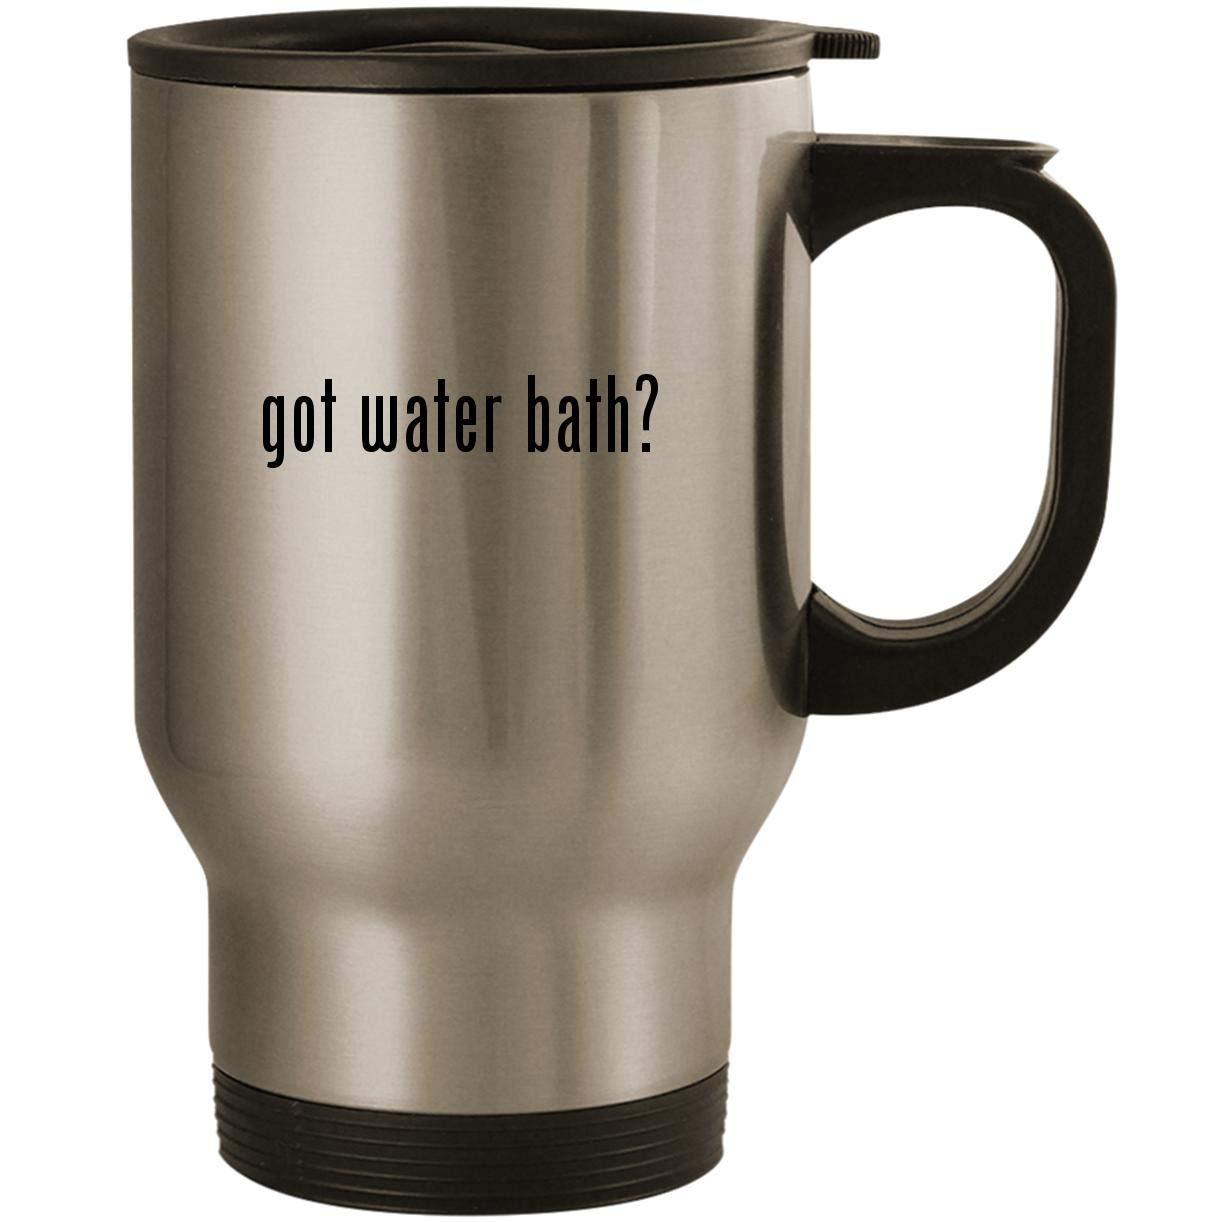 got water bath? - Stainless Steel 14oz Road Ready Travel Mug, Silver